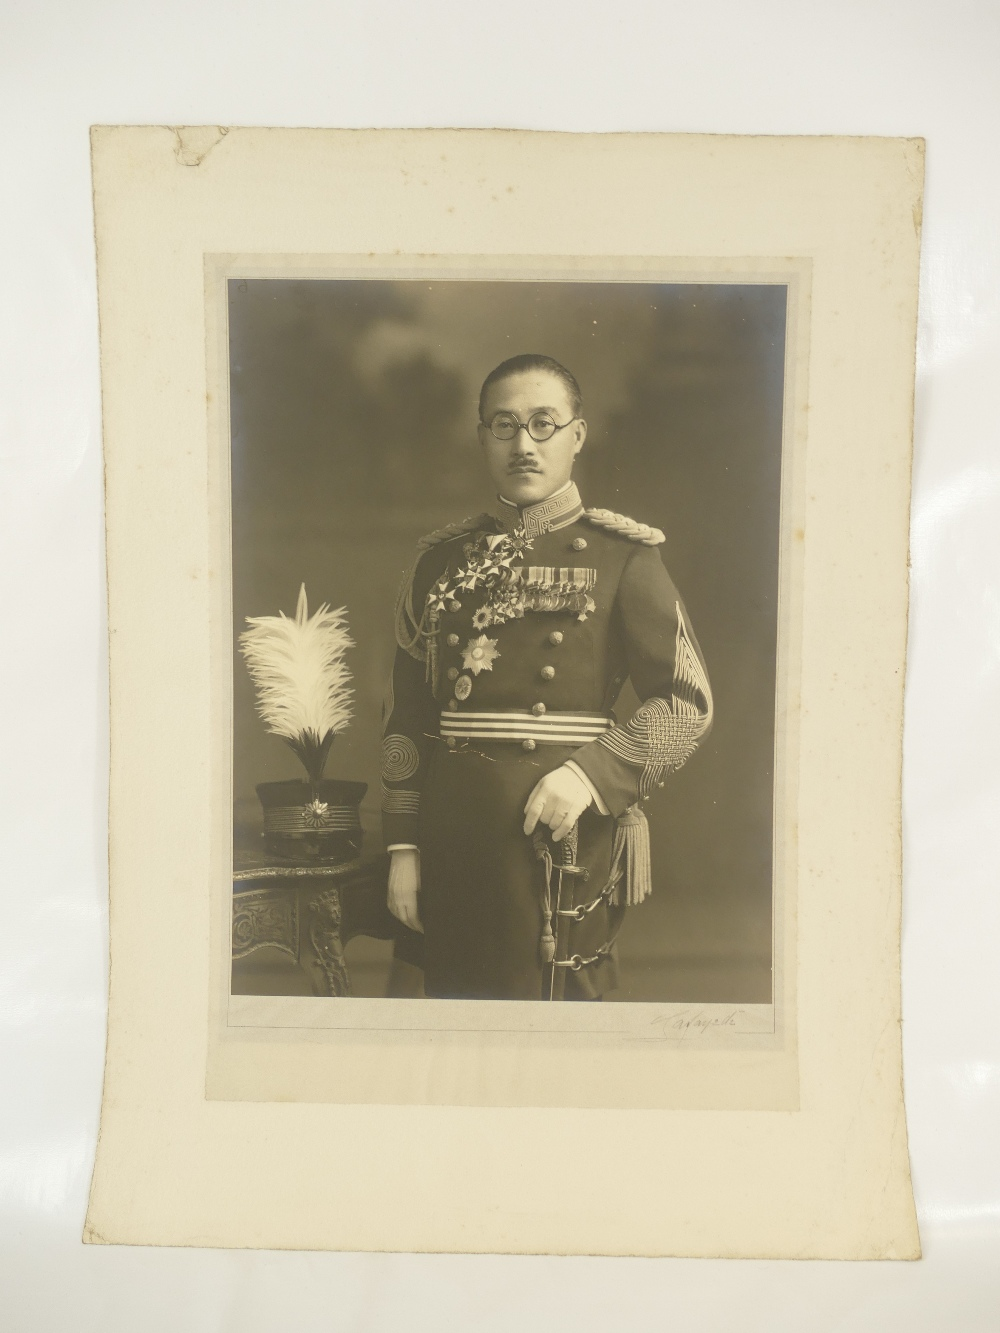 Lot 13 - Marquis General Toshinari Maeda Japan 1885 - 1942 - Japanese general active during WWII - large